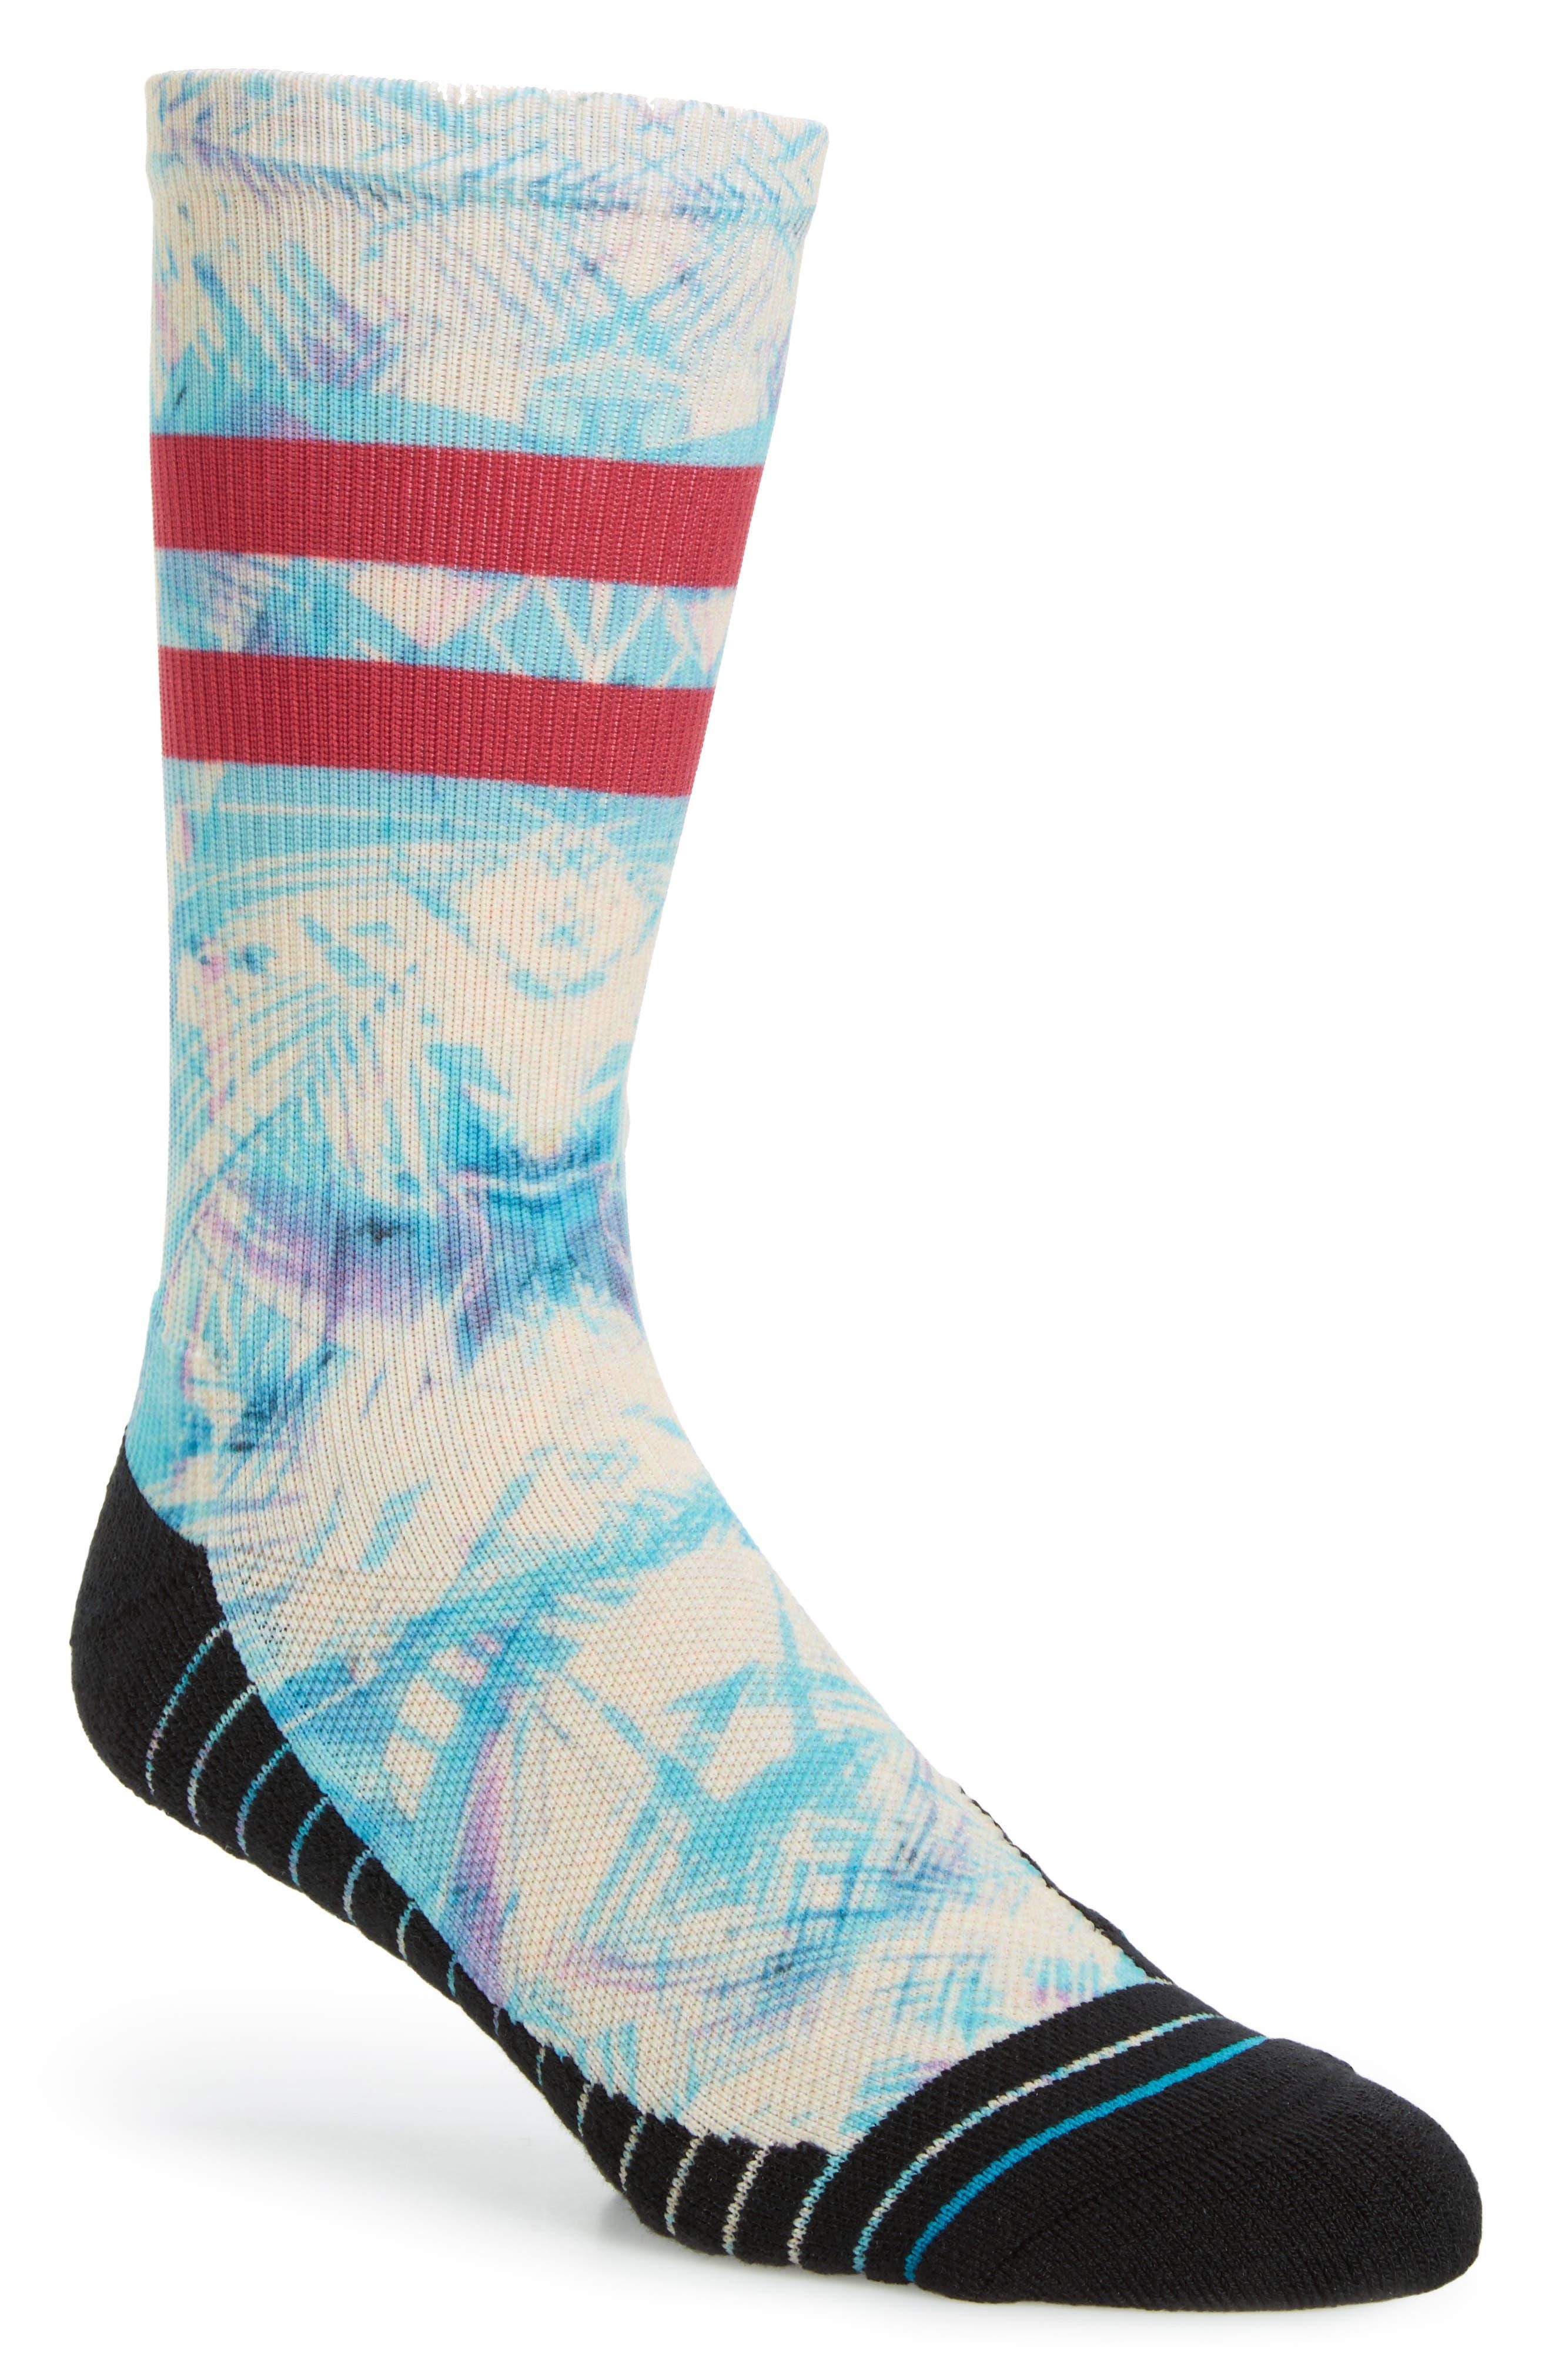 Ultraviolet Atheltic Crew Socks,                             Main thumbnail 1, color,                             420